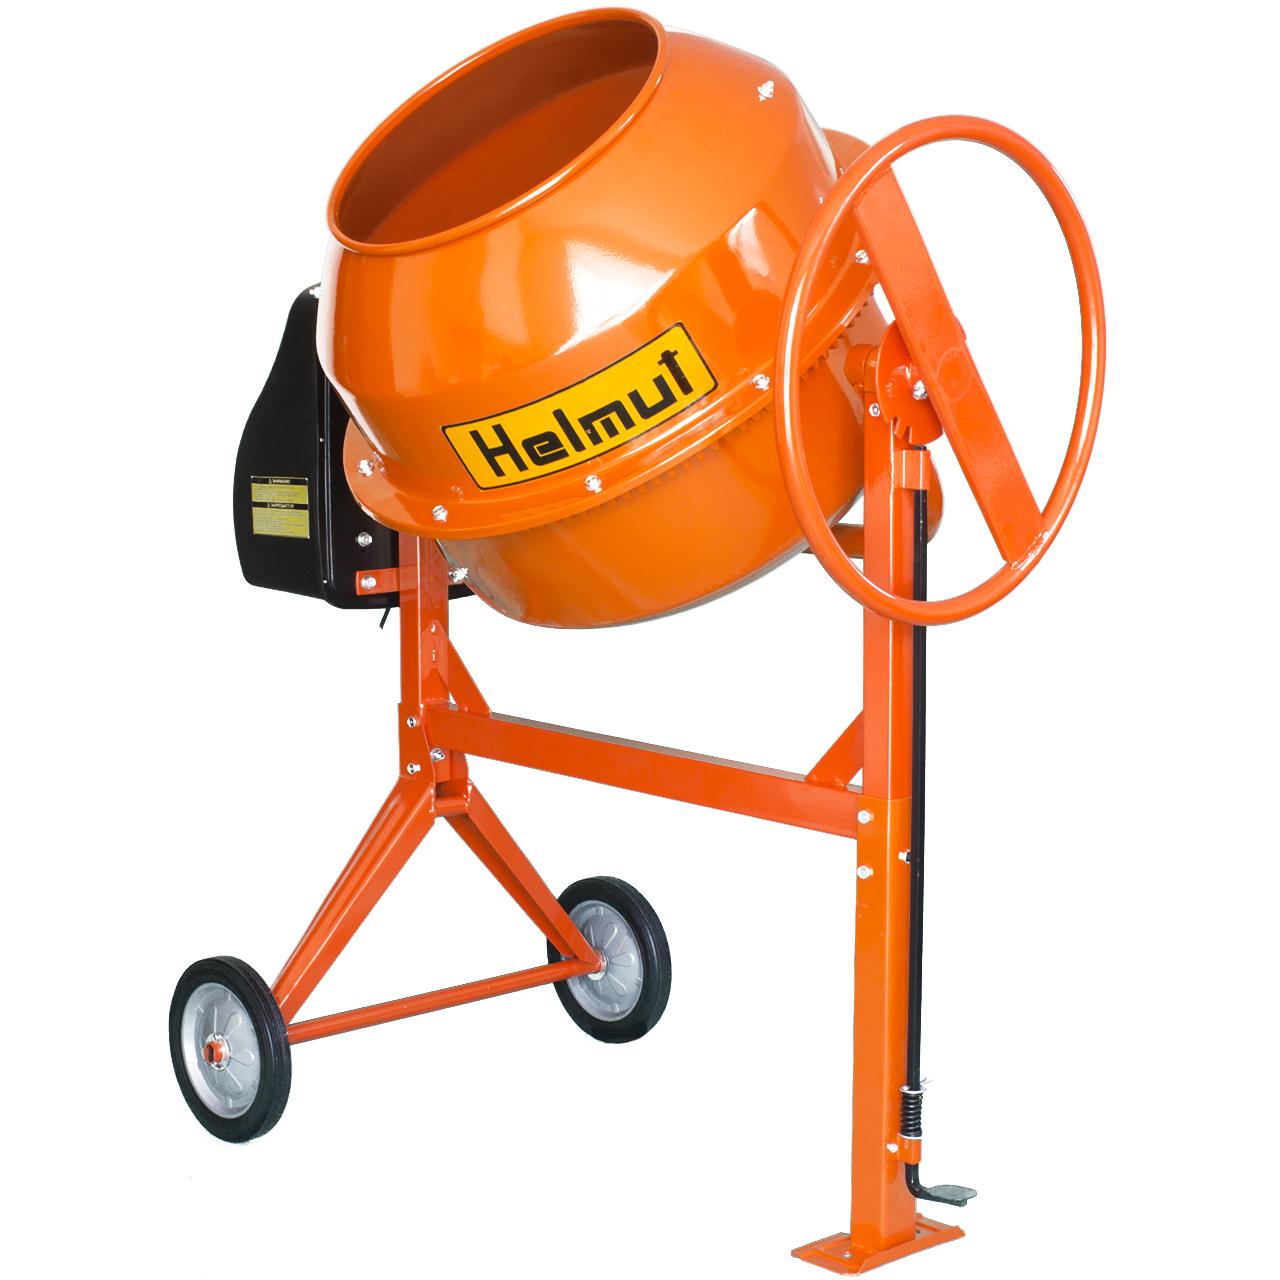 Бетоносмеситель Helmut CM160  бетоносмеситель электрический helmut bm180